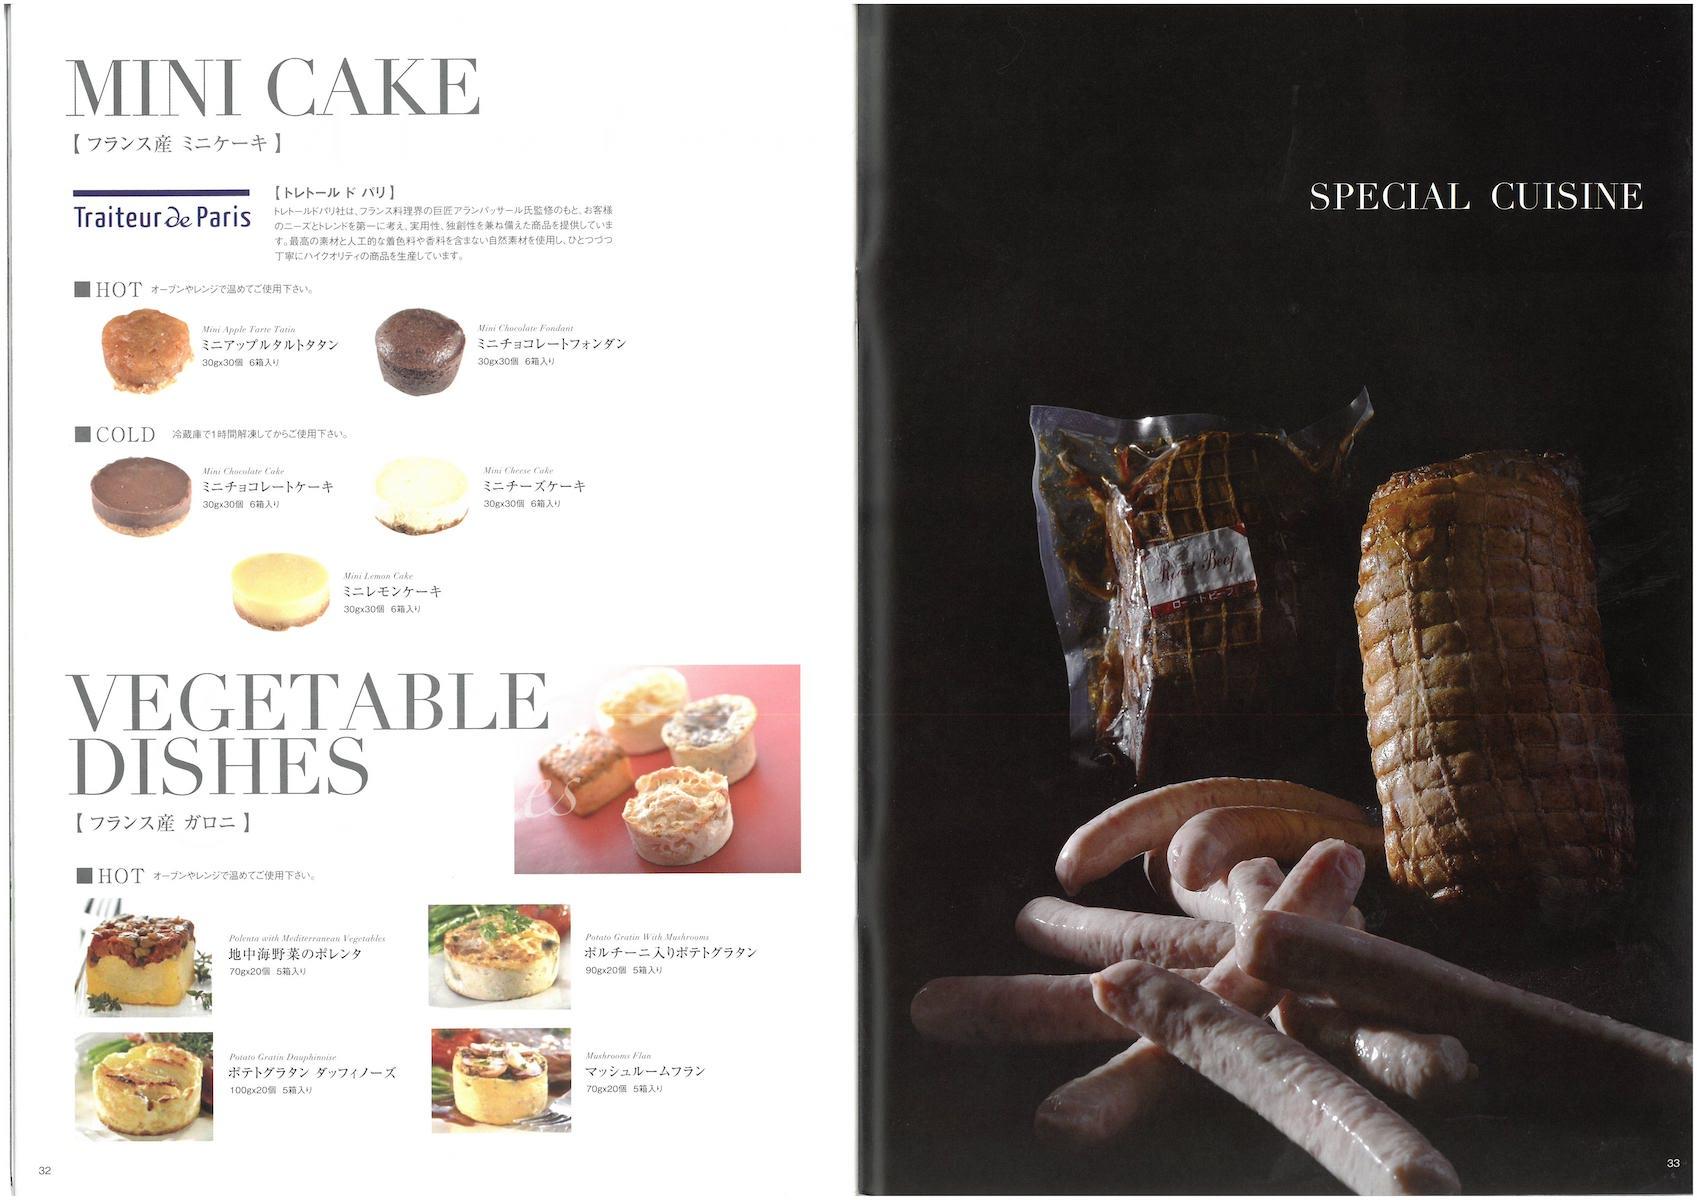 K.K.ヤマオカ 総合高級食品卸・貿易業務